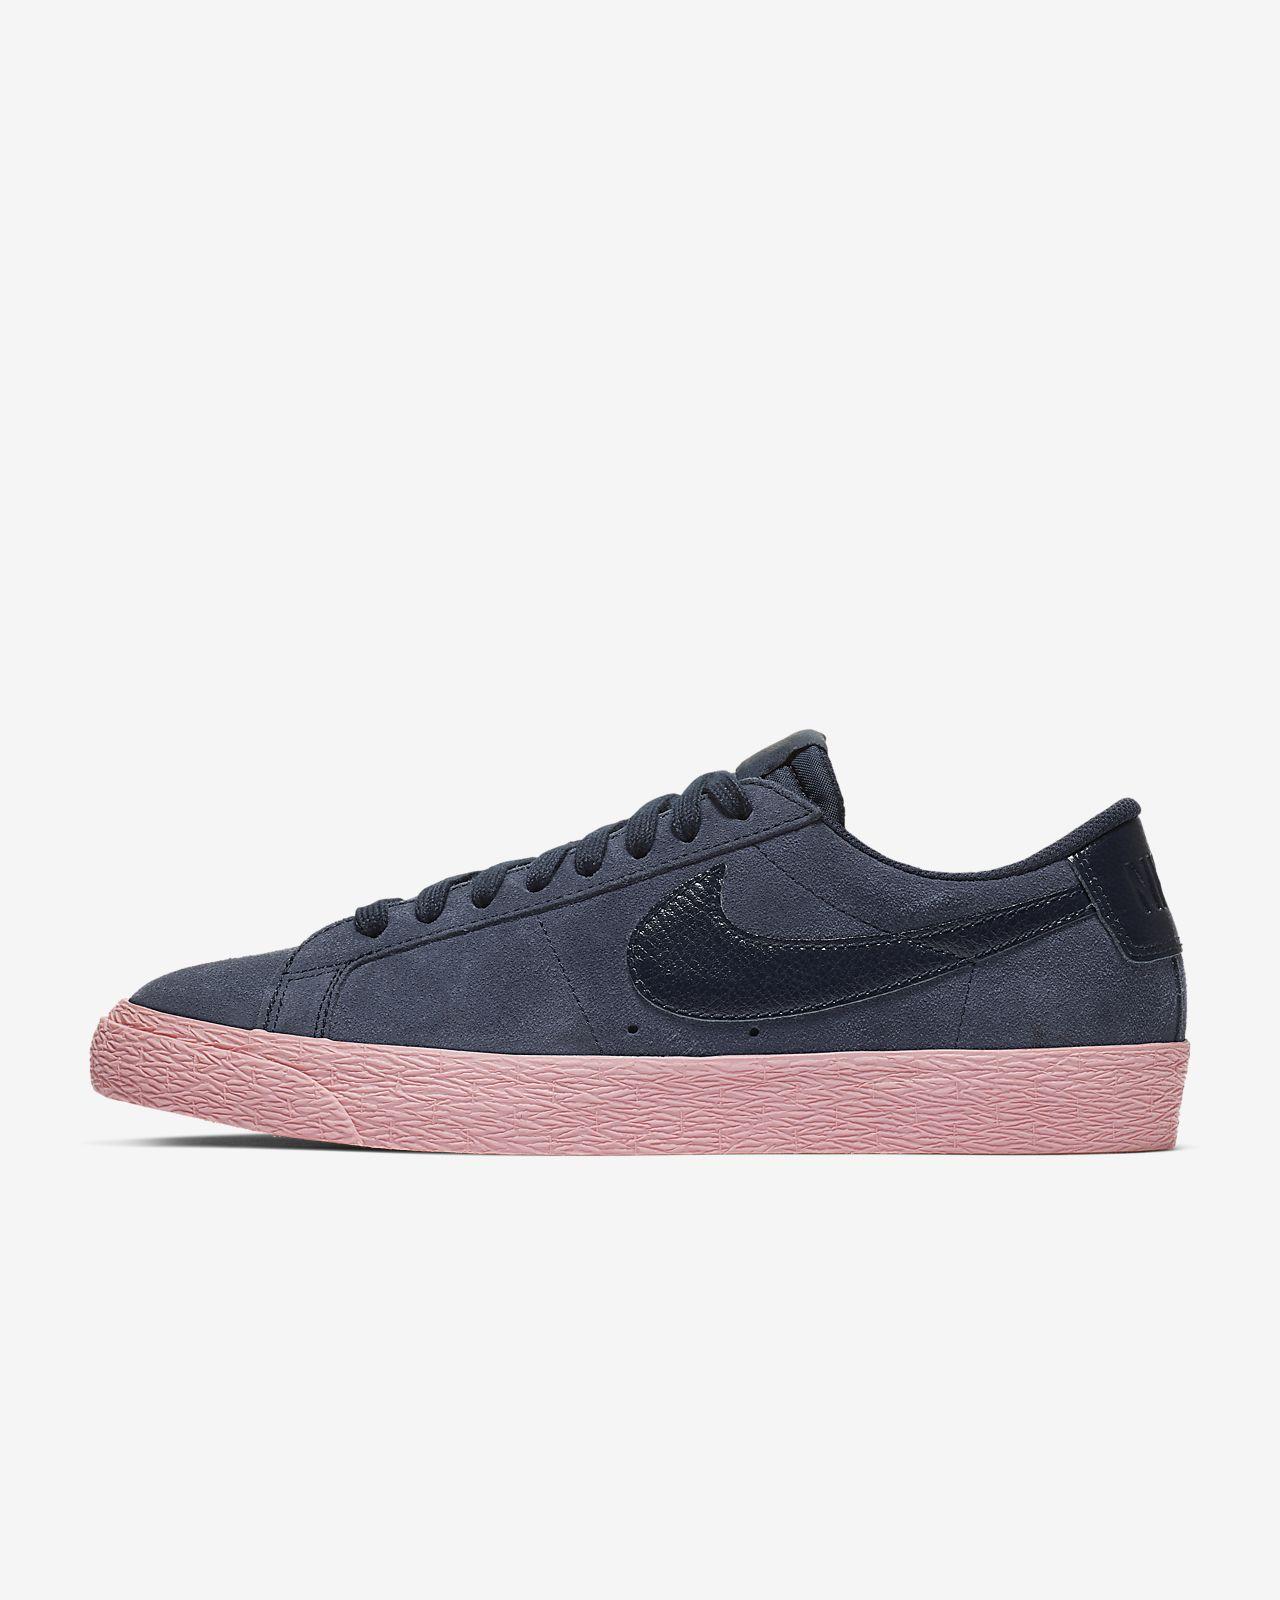 Skateboardsko Nike SB Blazer Zoom Low för män